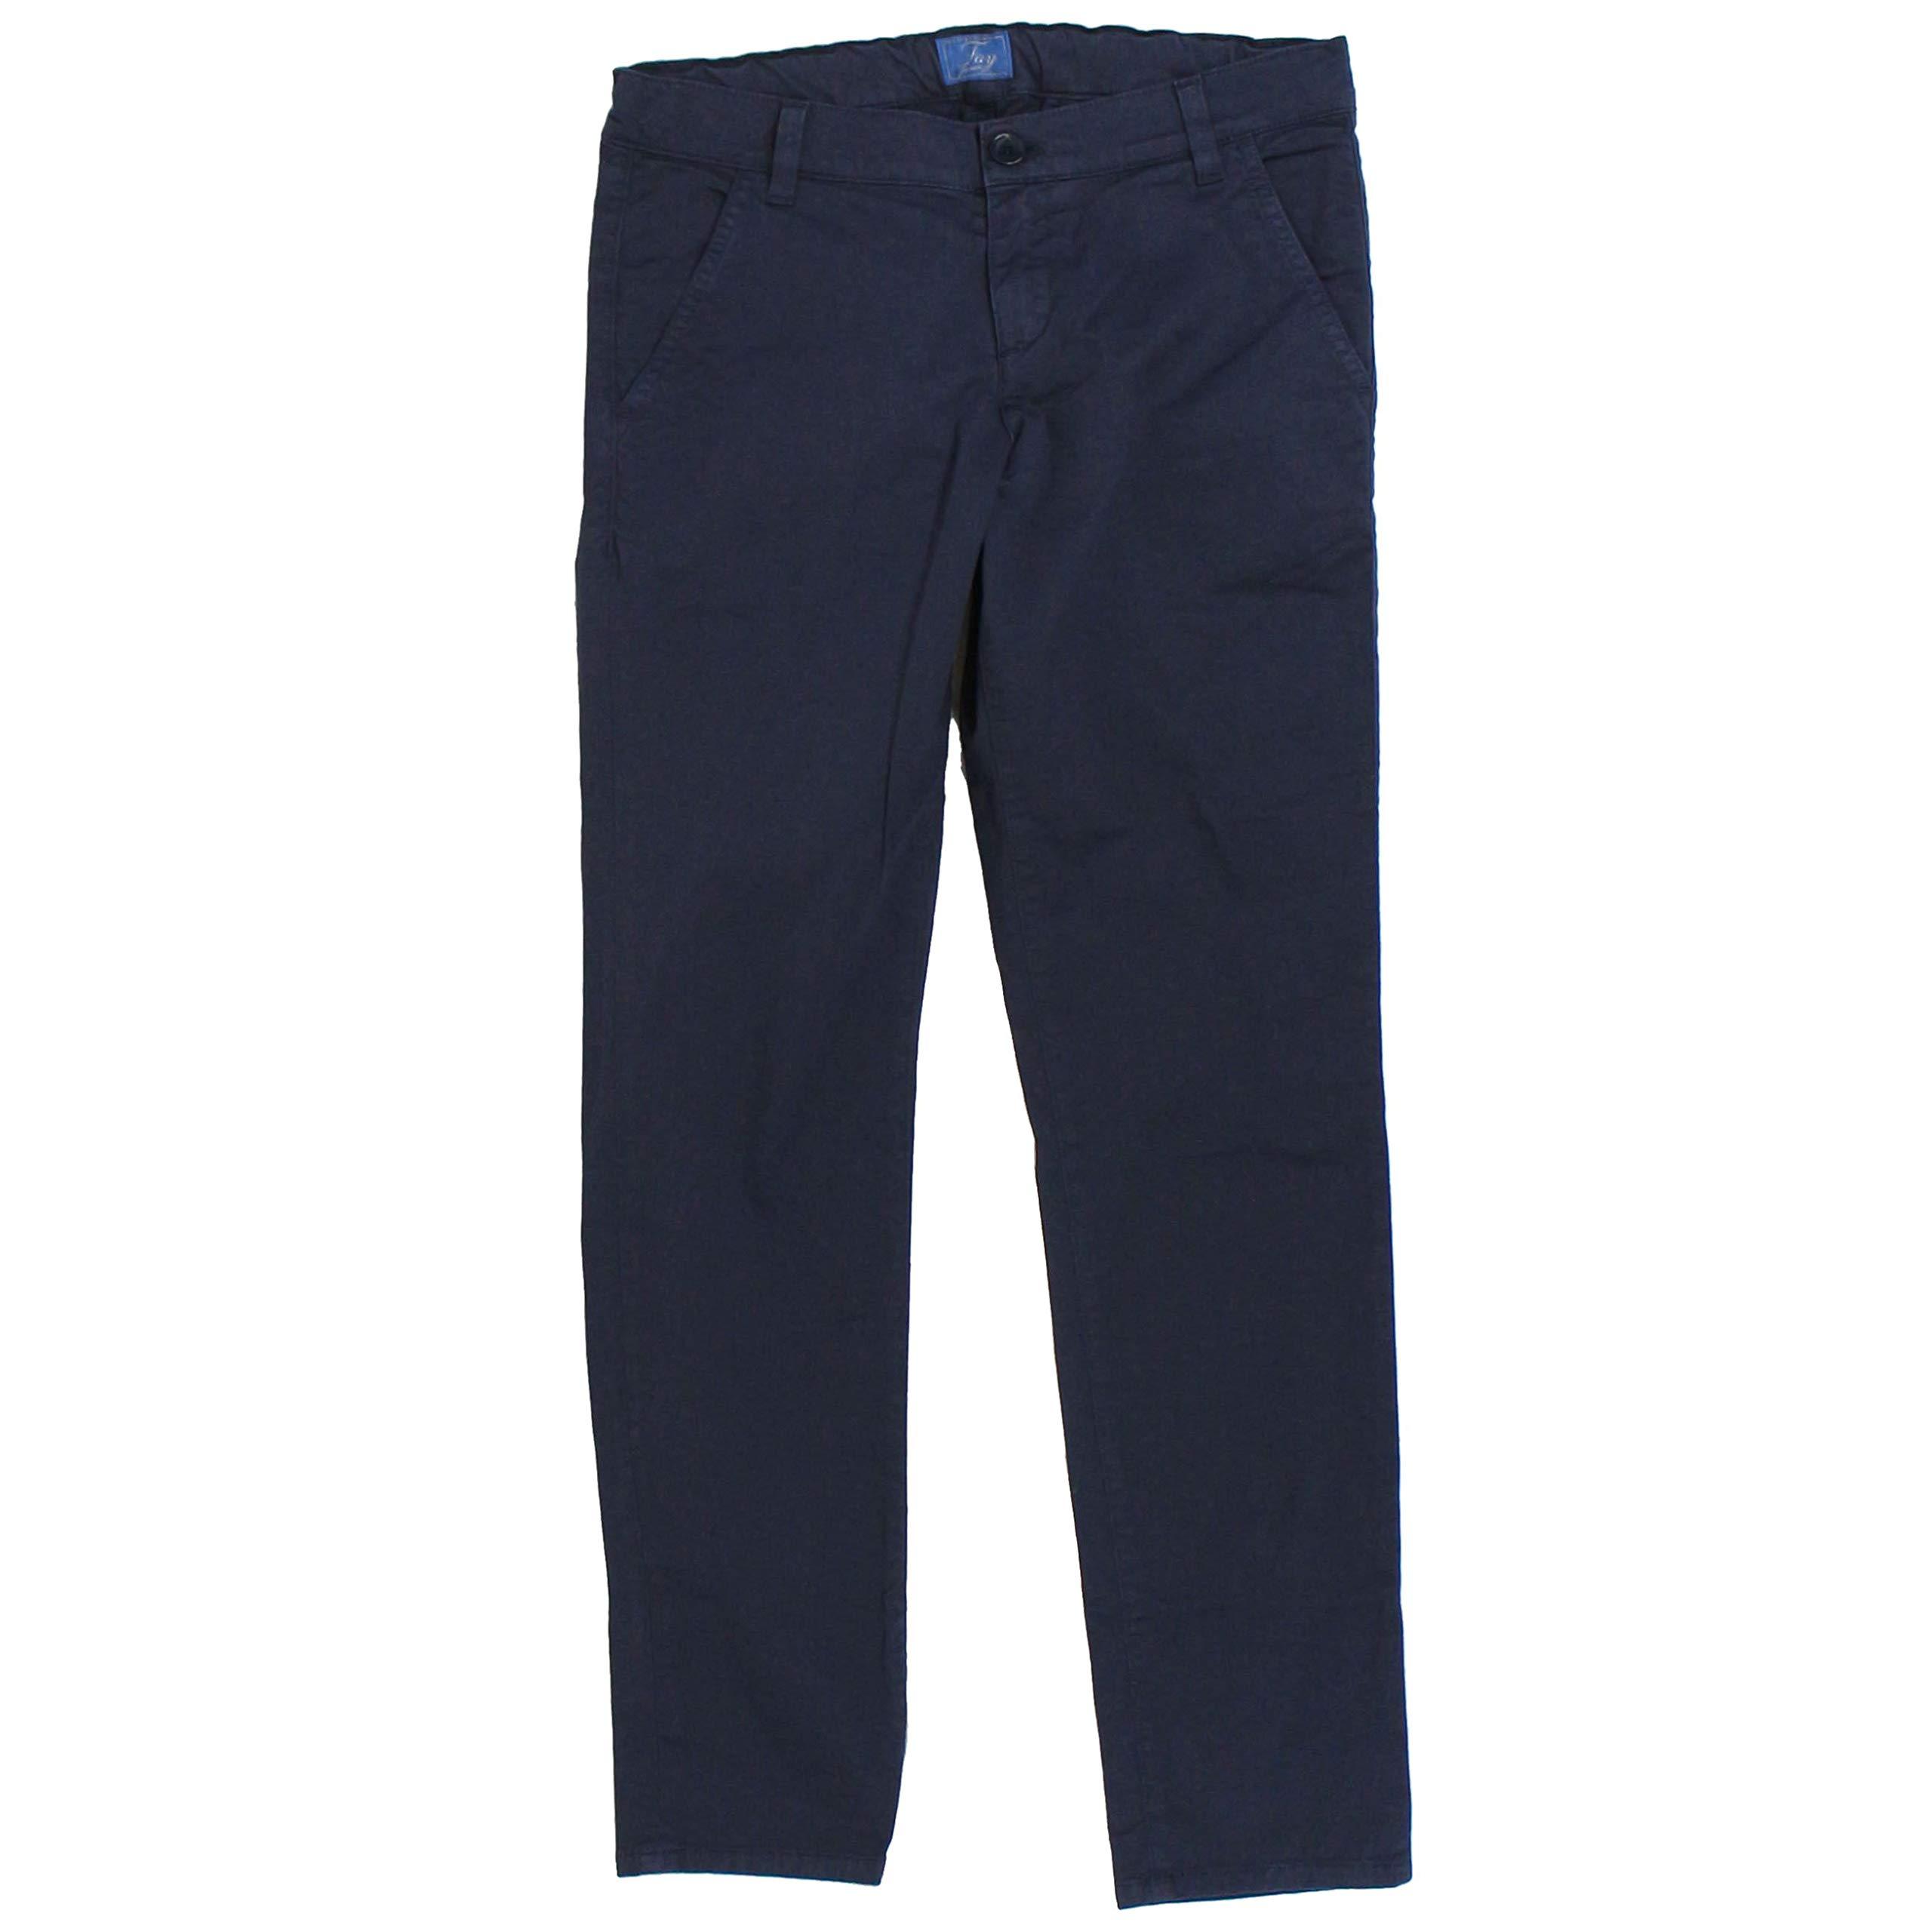 fay Boys Nuh8038732tqpsu807 Blue Cotton Pants